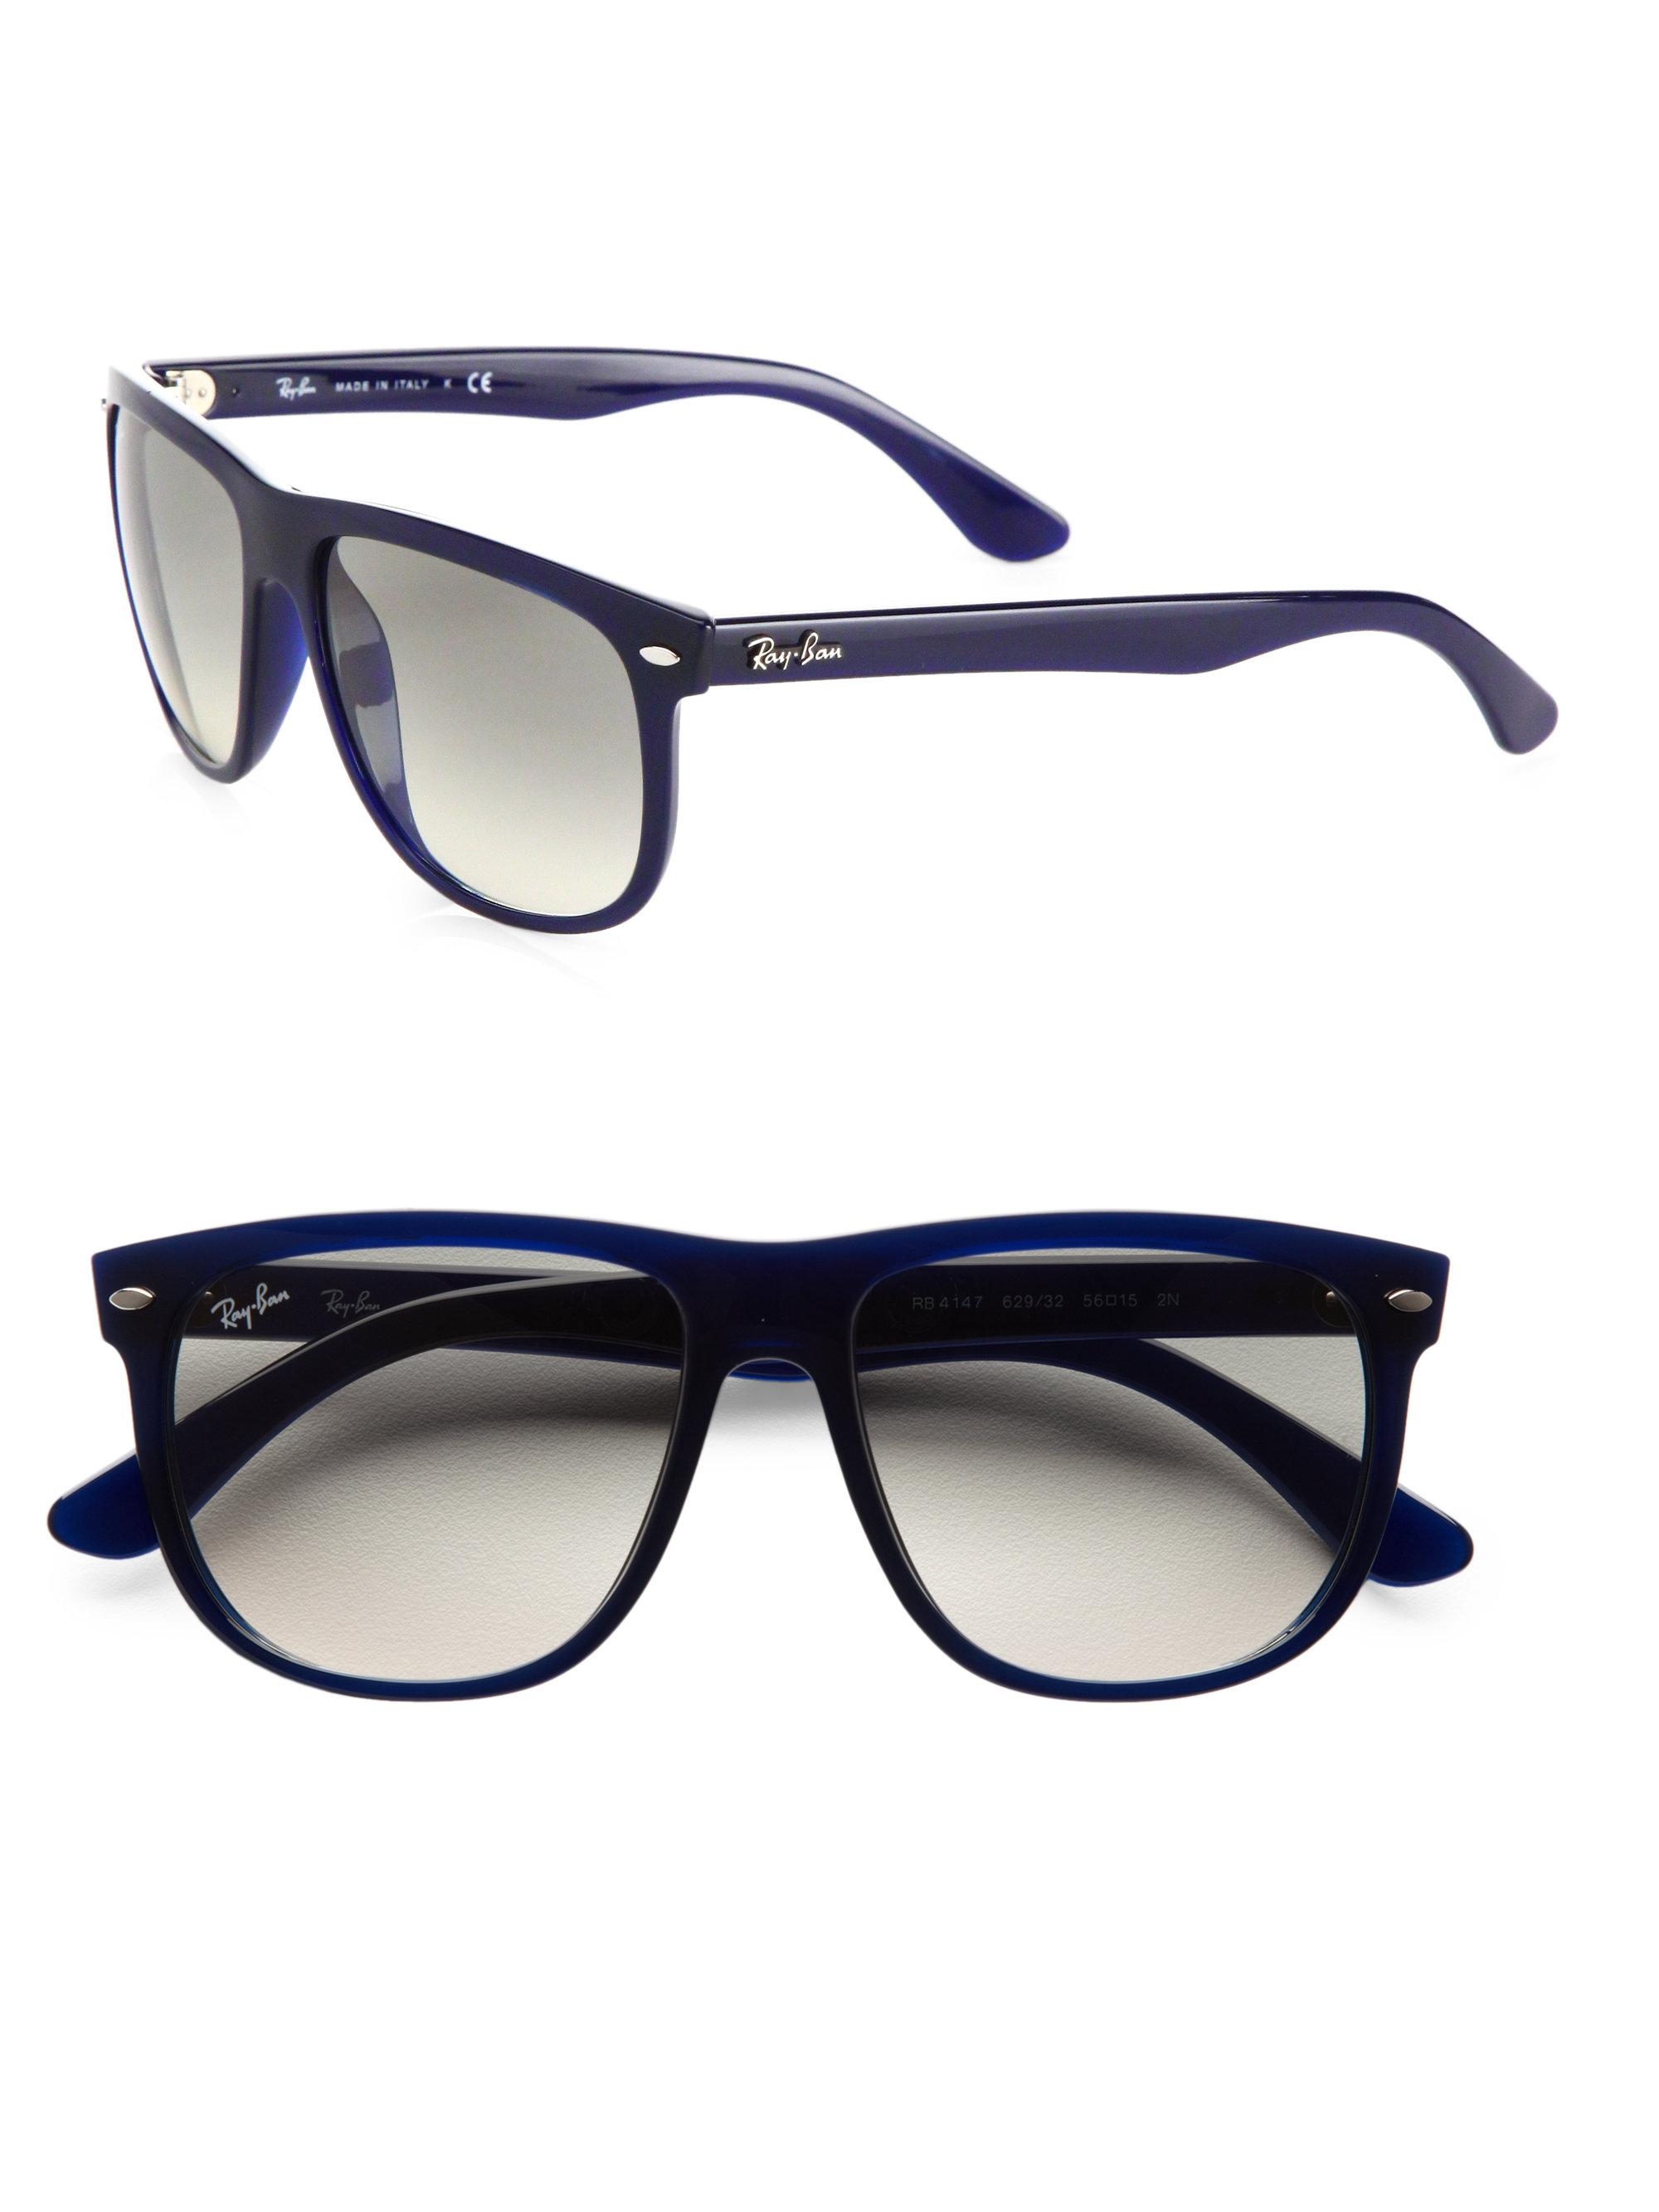 ray ban ray ban ray ban sale sunglasses. Black Bedroom Furniture Sets. Home Design Ideas